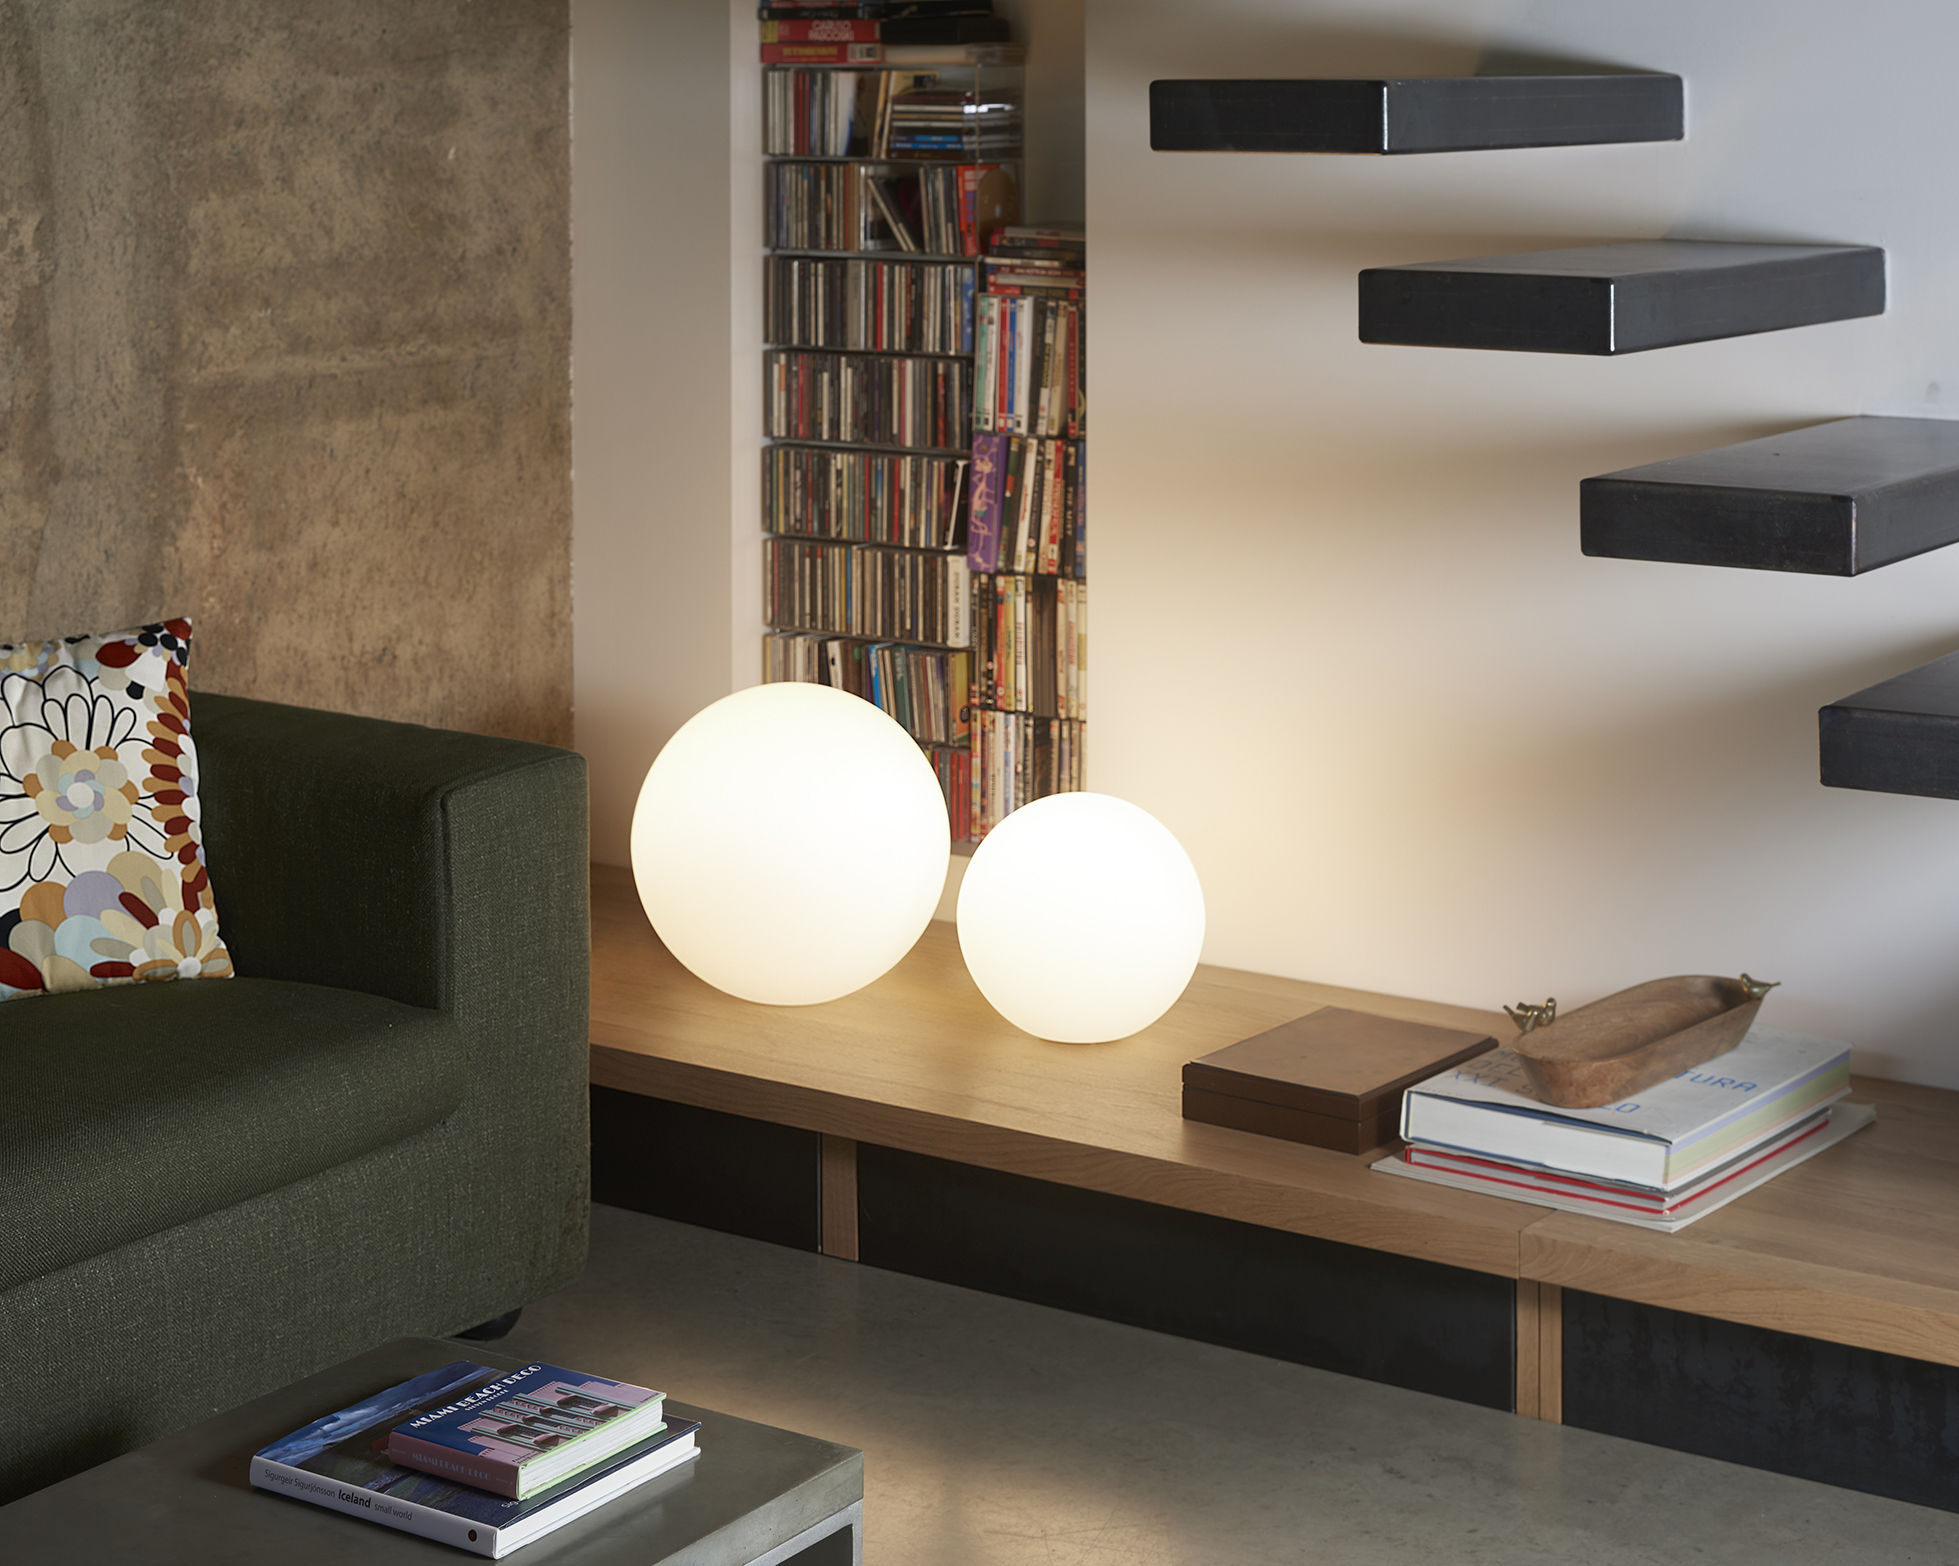 Scopri lampada senza fili globo outdoor led Ø 25 cm per l